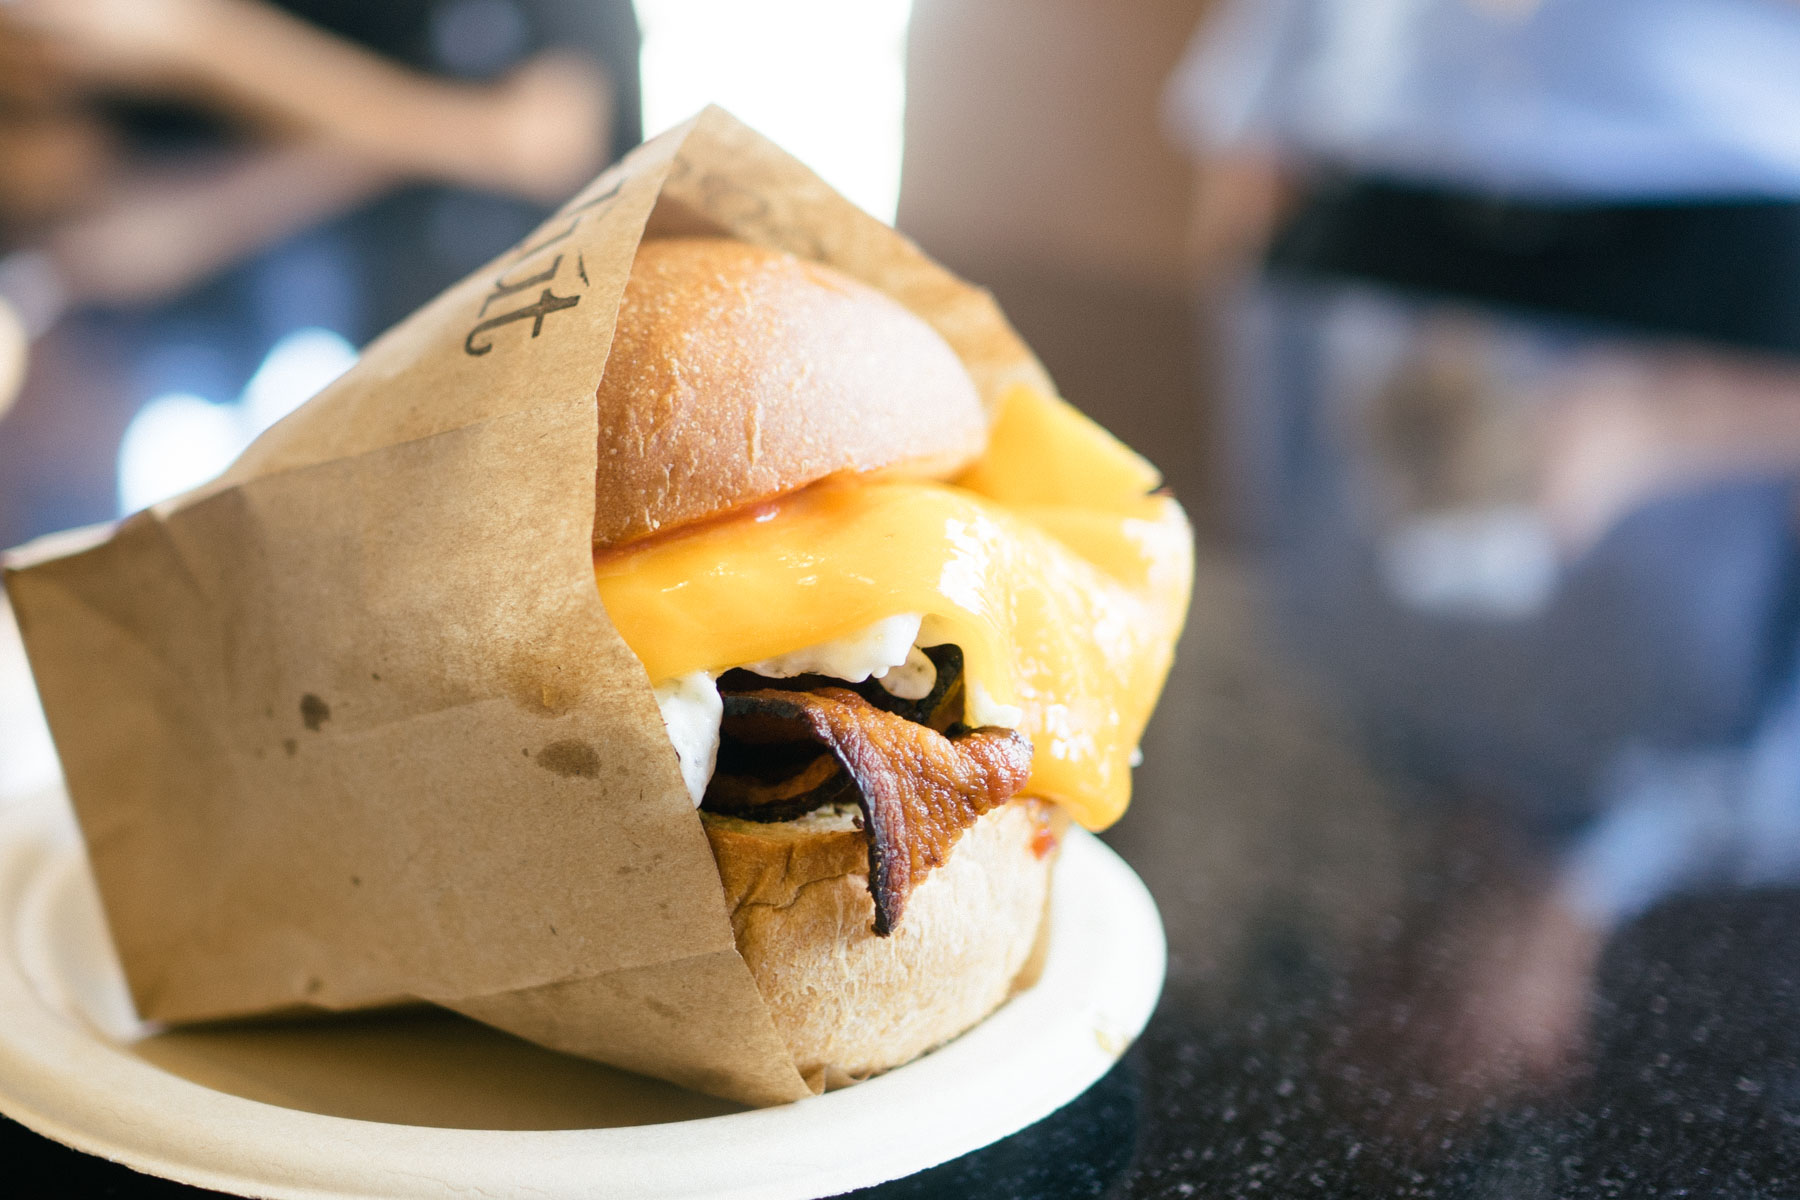 eggslut-eggs-slut-los-angeles-downtown-la-best-food-restaurants-6